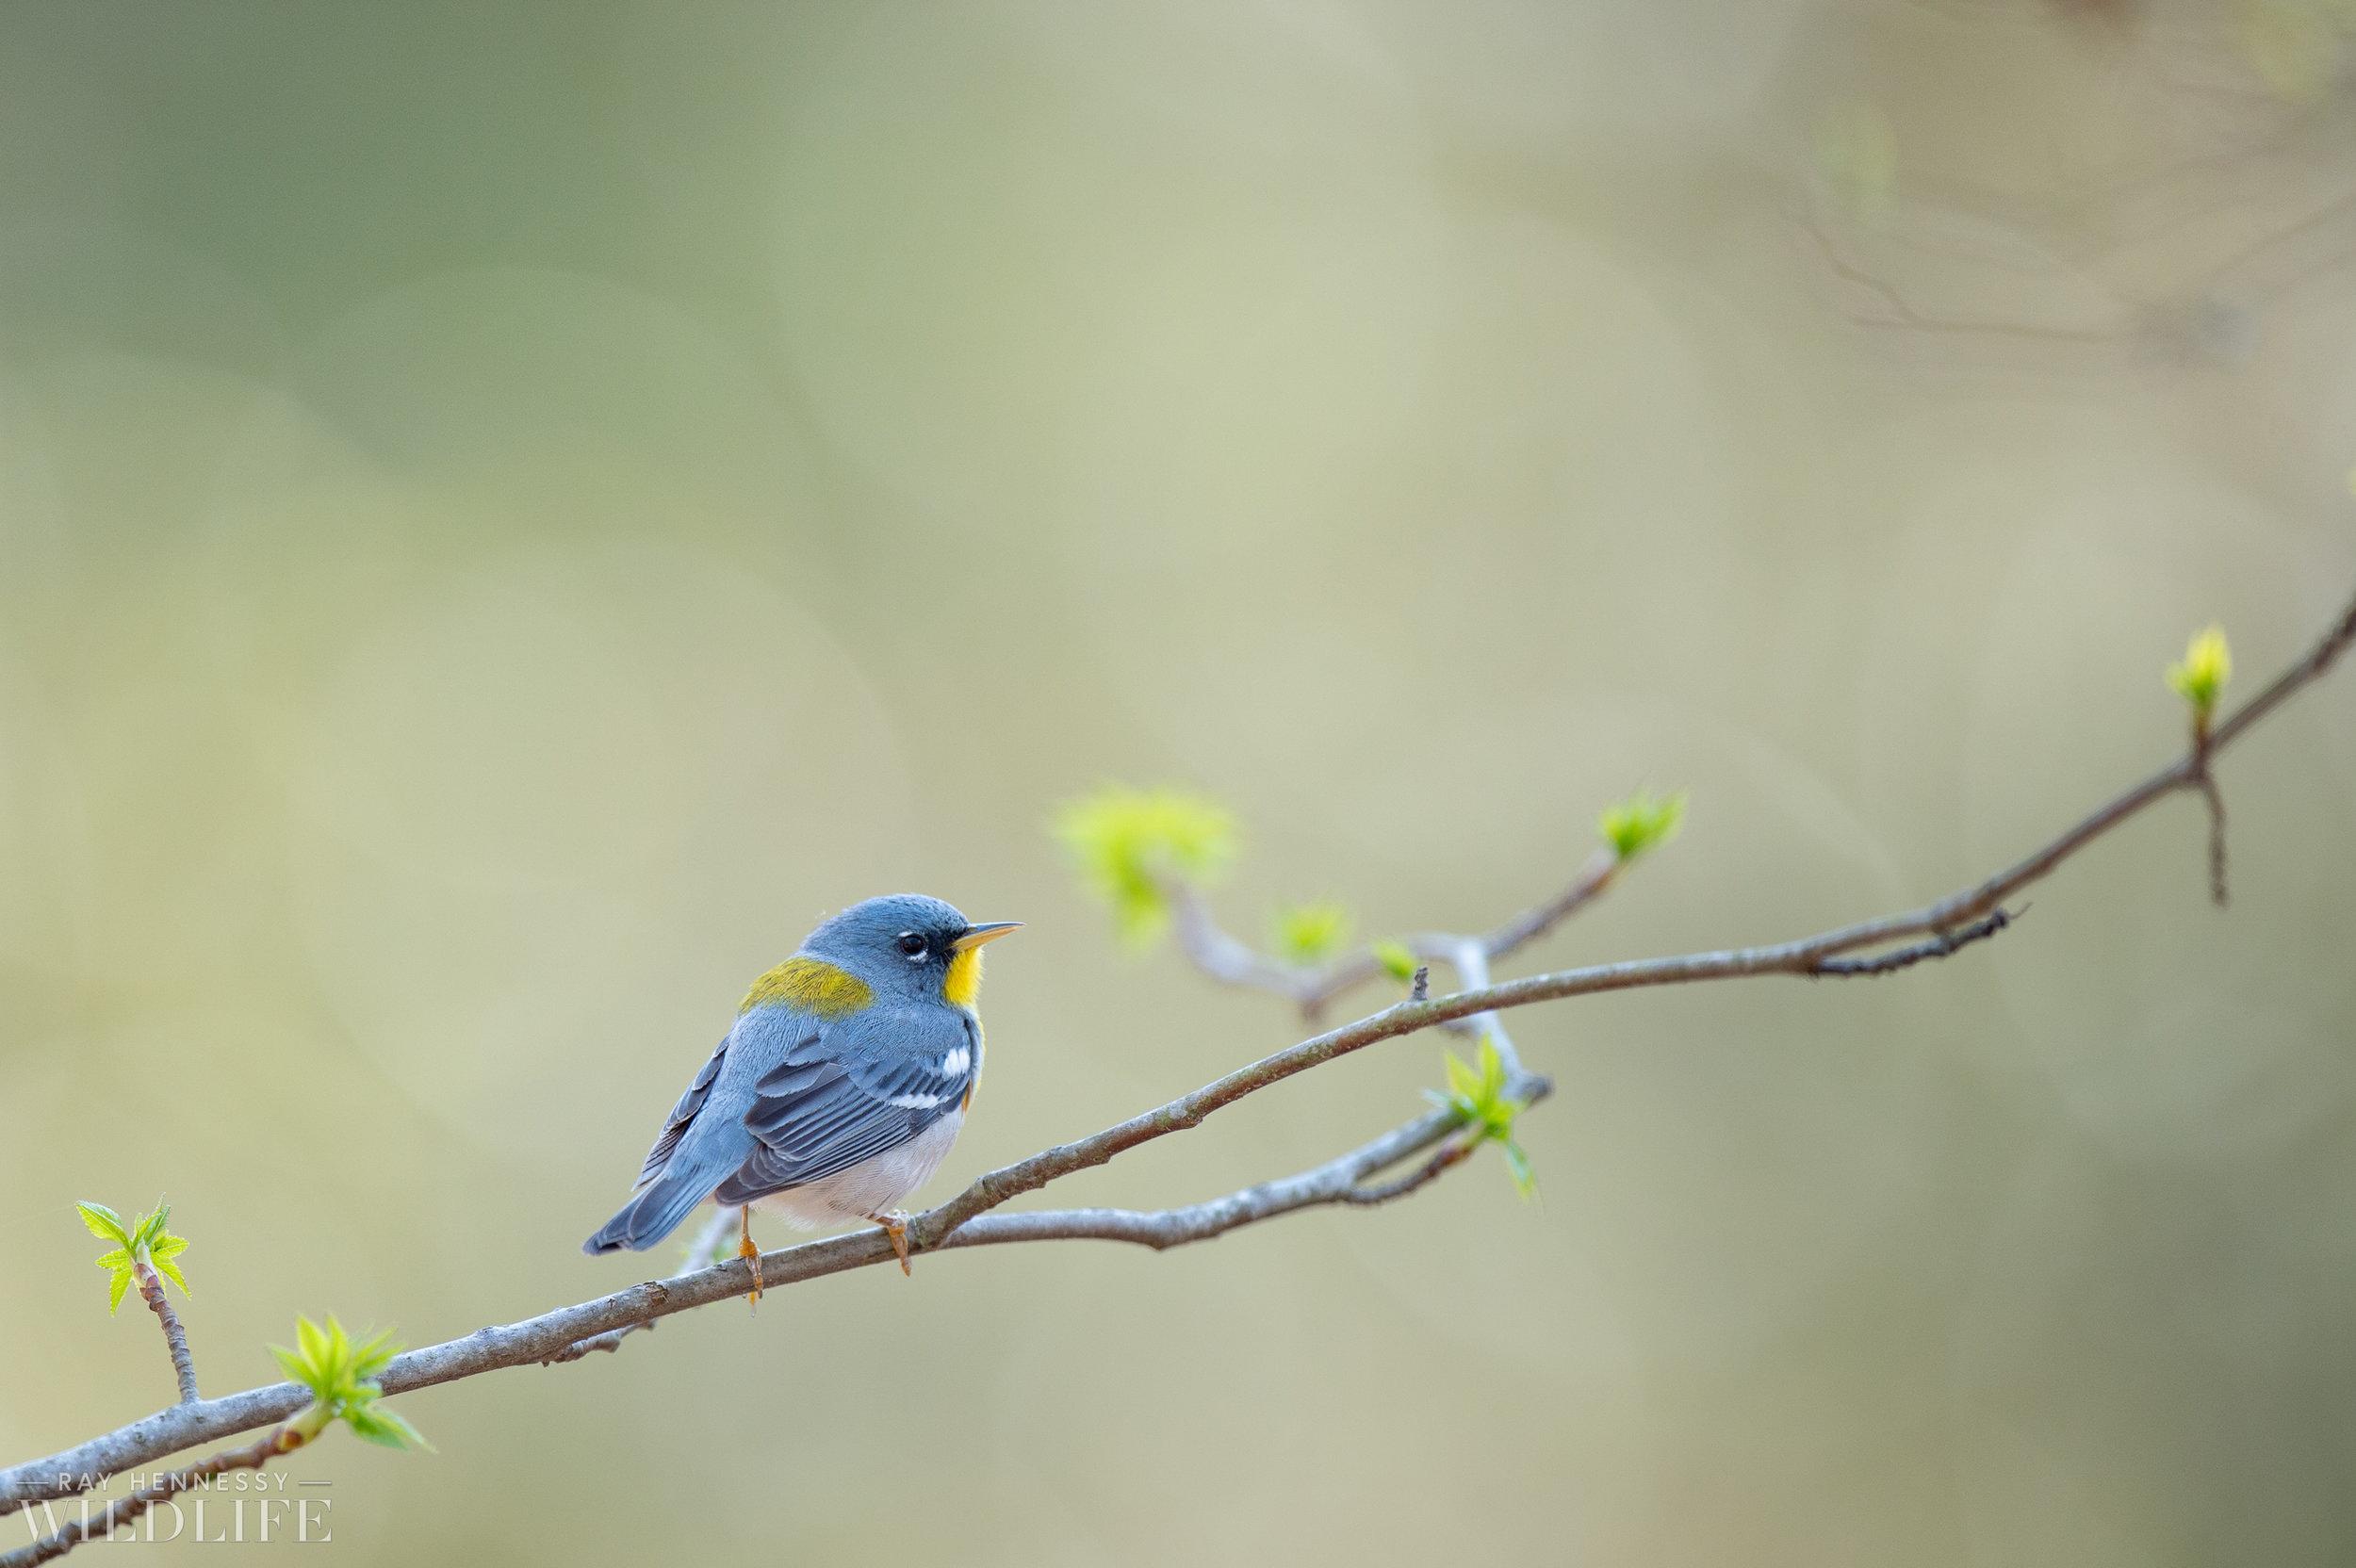 016_spring-warblers-new-jersey.jpg